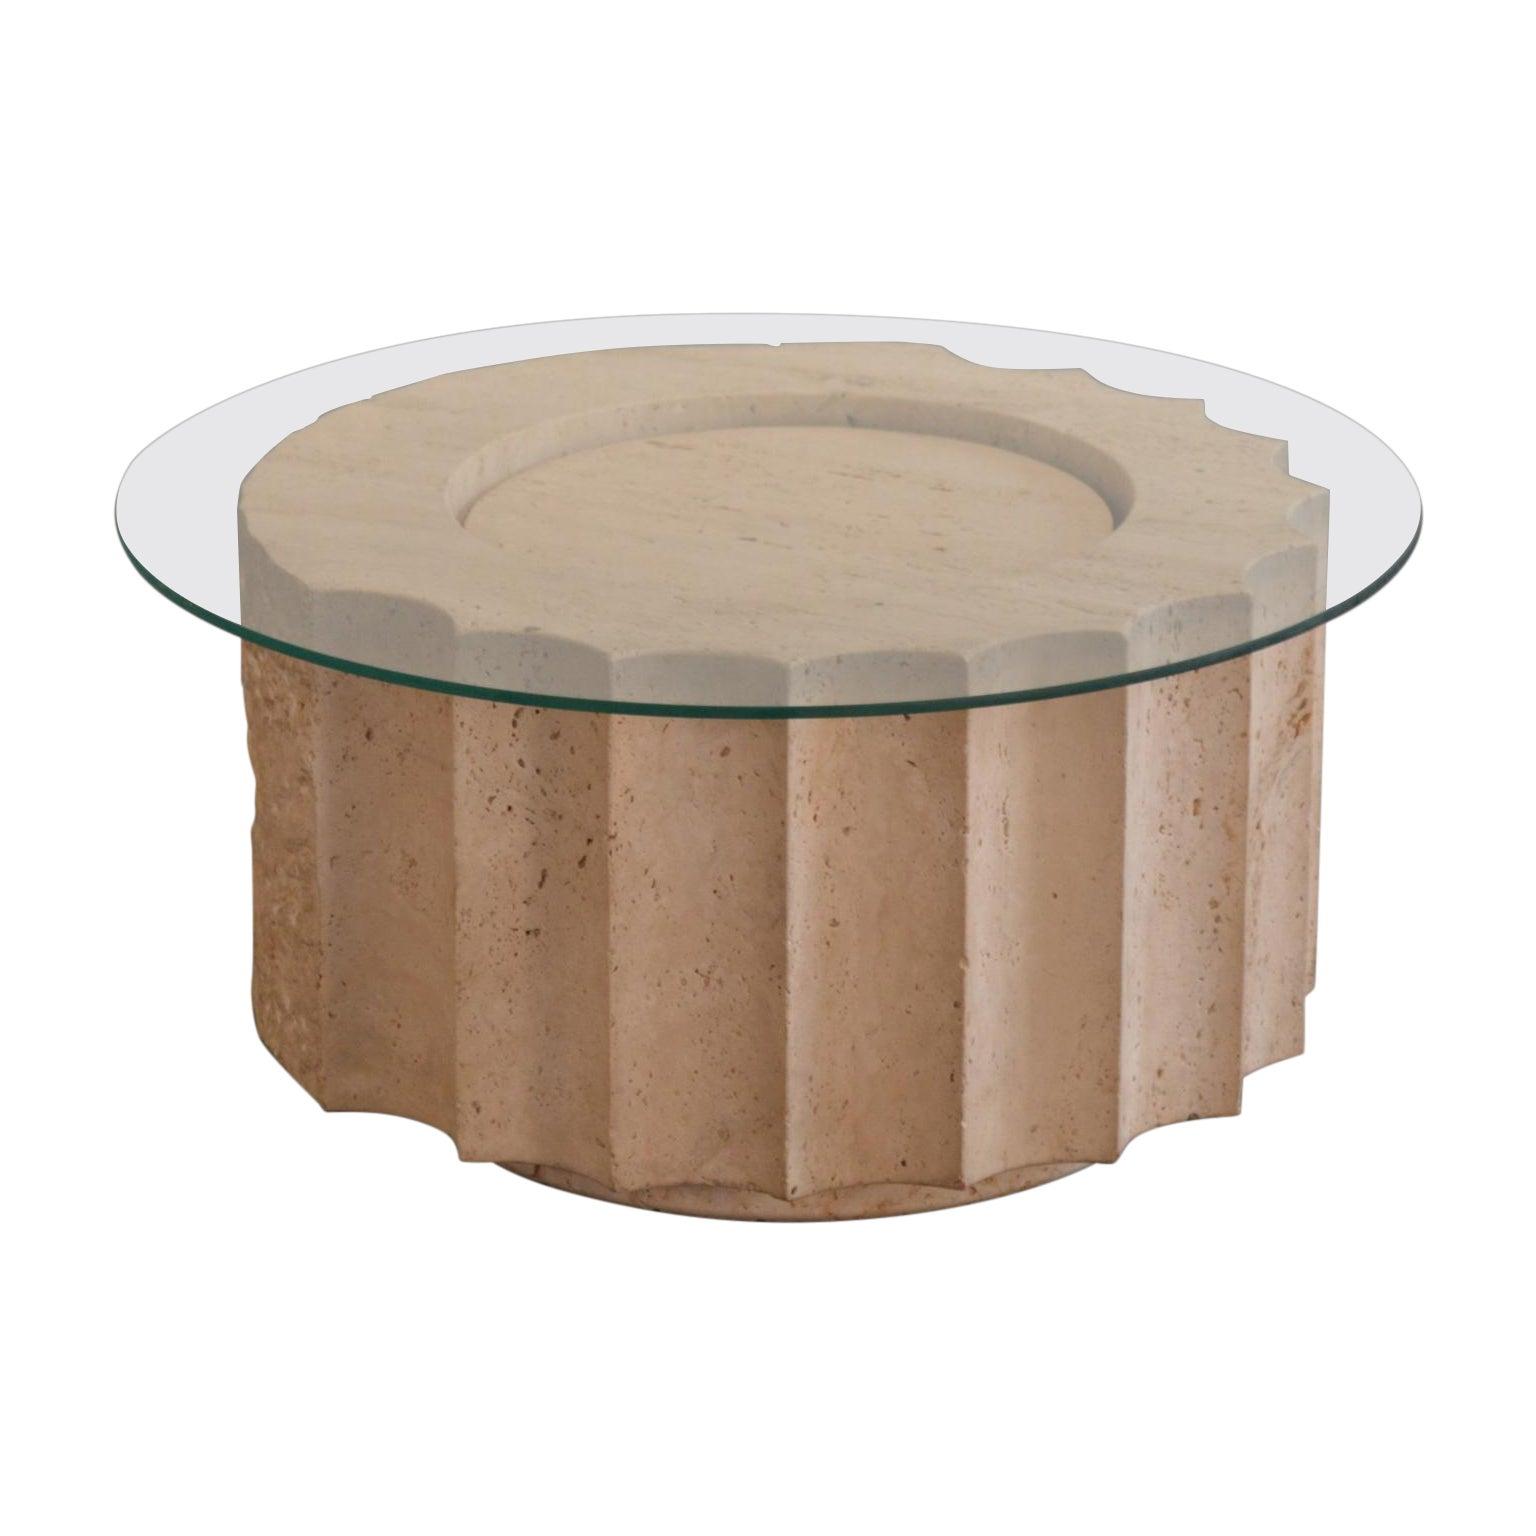 Post-Modern Travertine Coffee Table